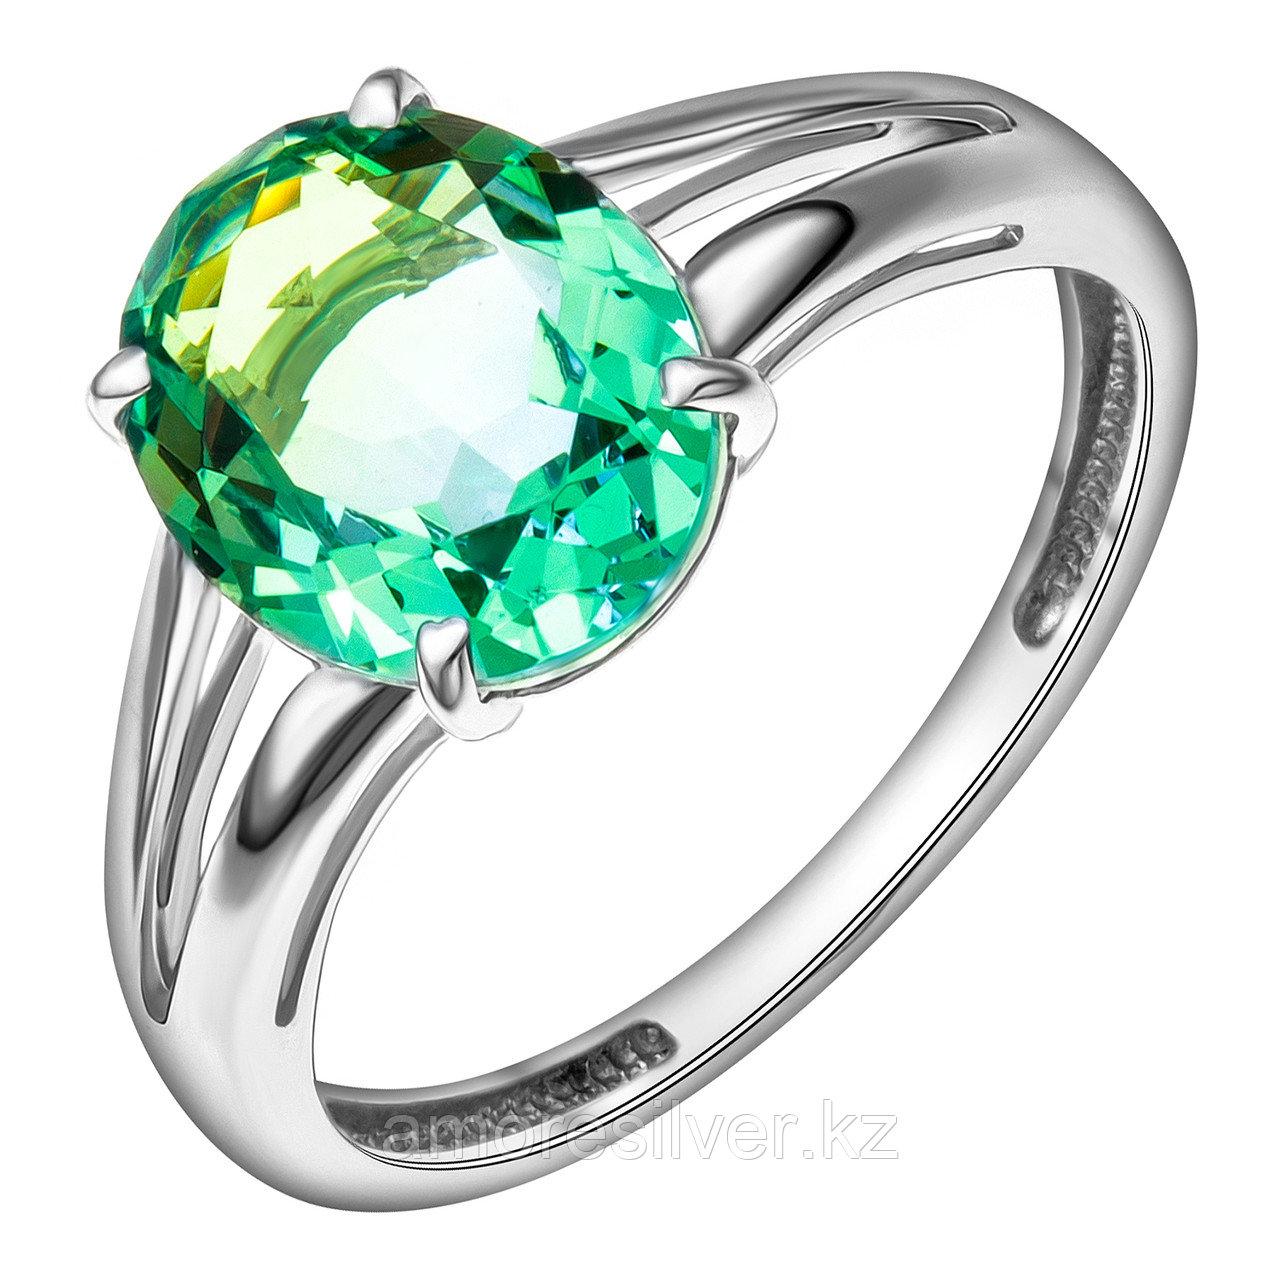 "Кольцо Teosa серебро с родием, фианит, ""каратник"" 1000-0205-PHT"